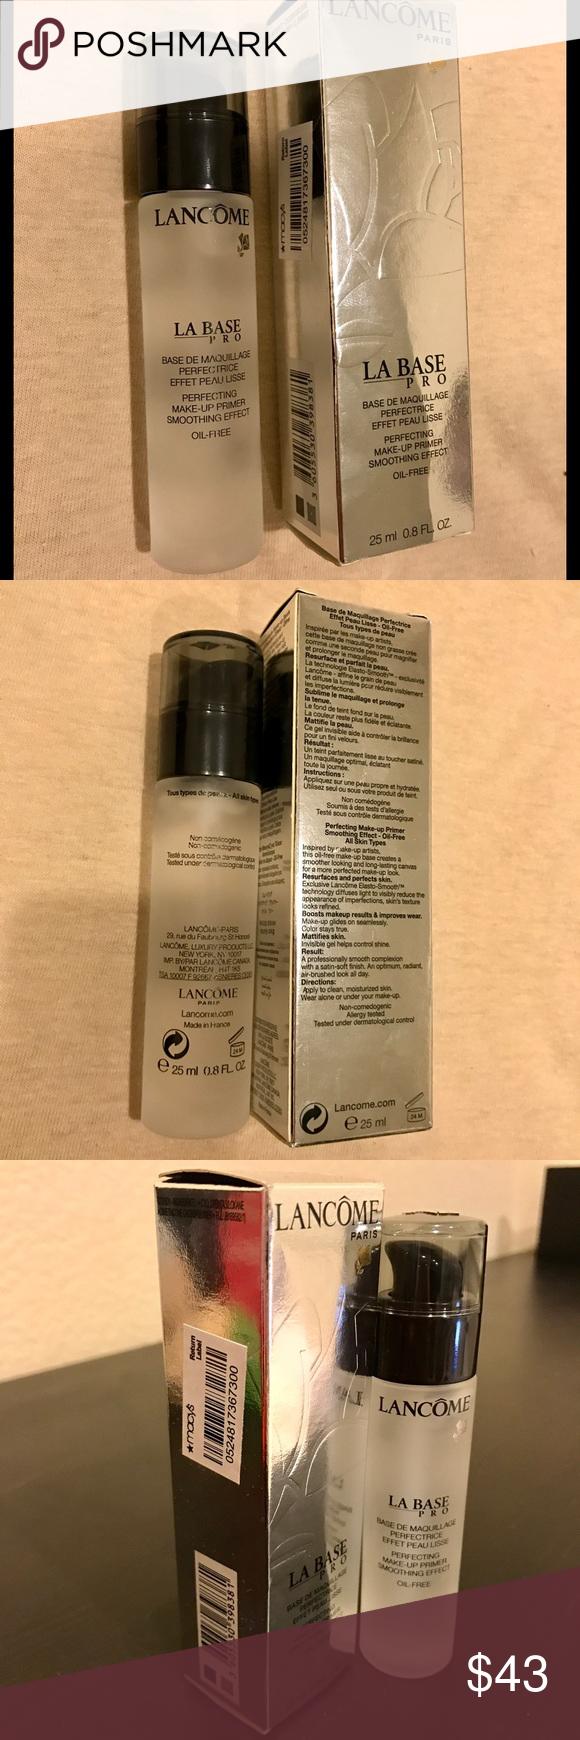 Lancôme 'La Base Pro' Perfecting Makeup Primer Makeup